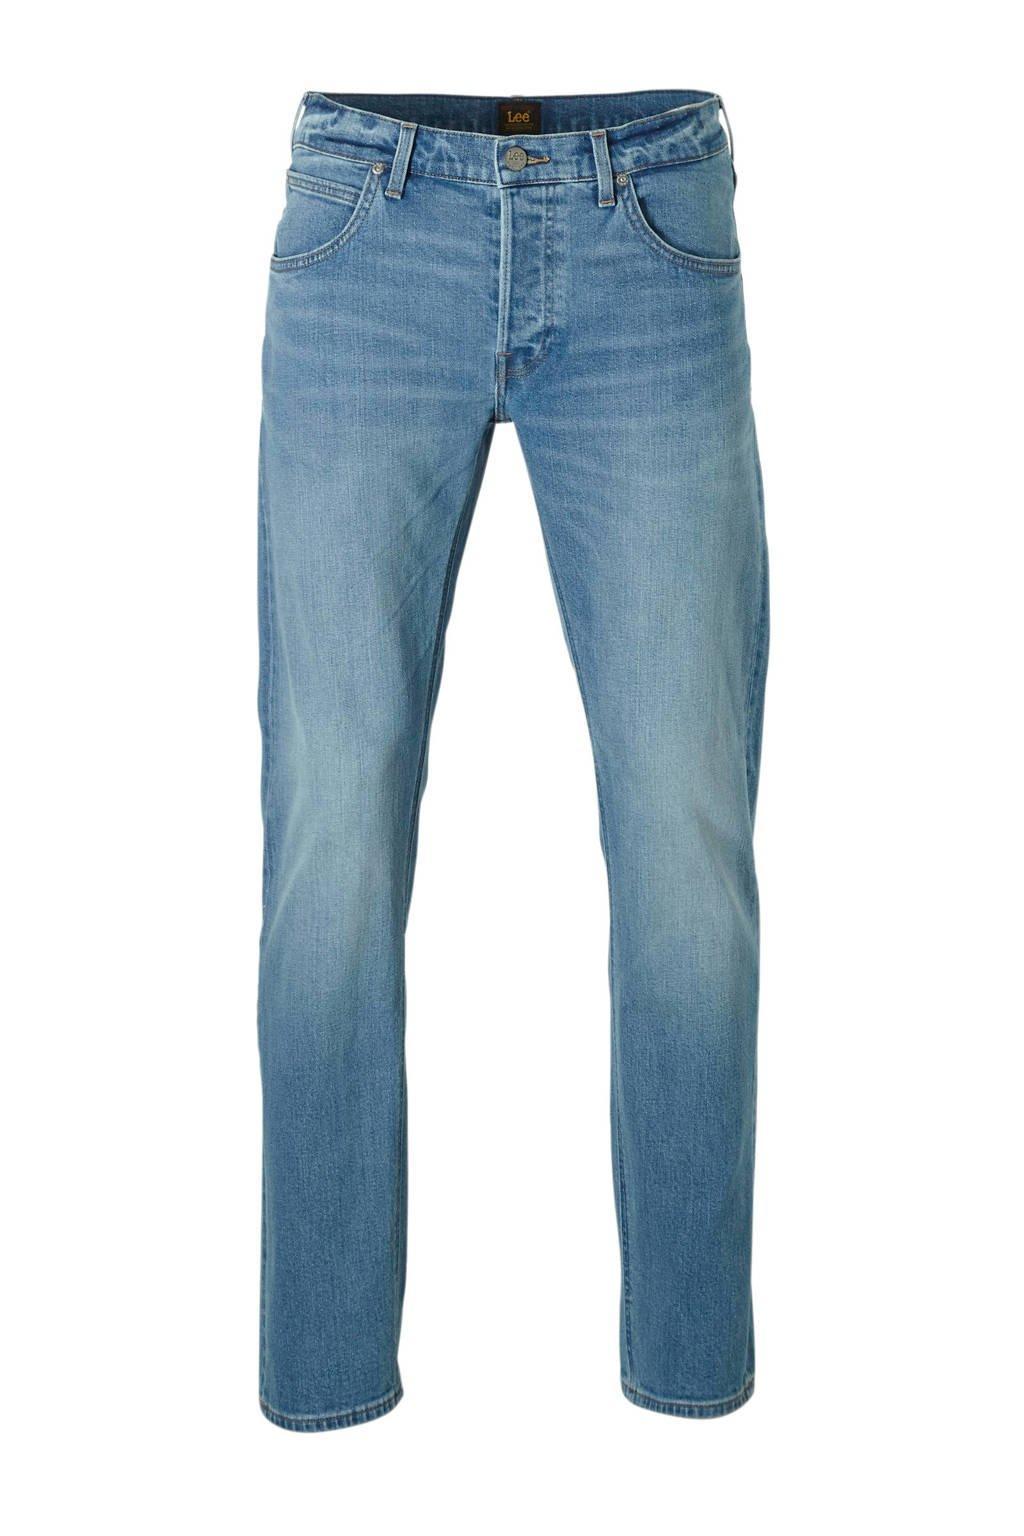 Lee regular fit jeans Daren, JXZX LIGHT DAZE